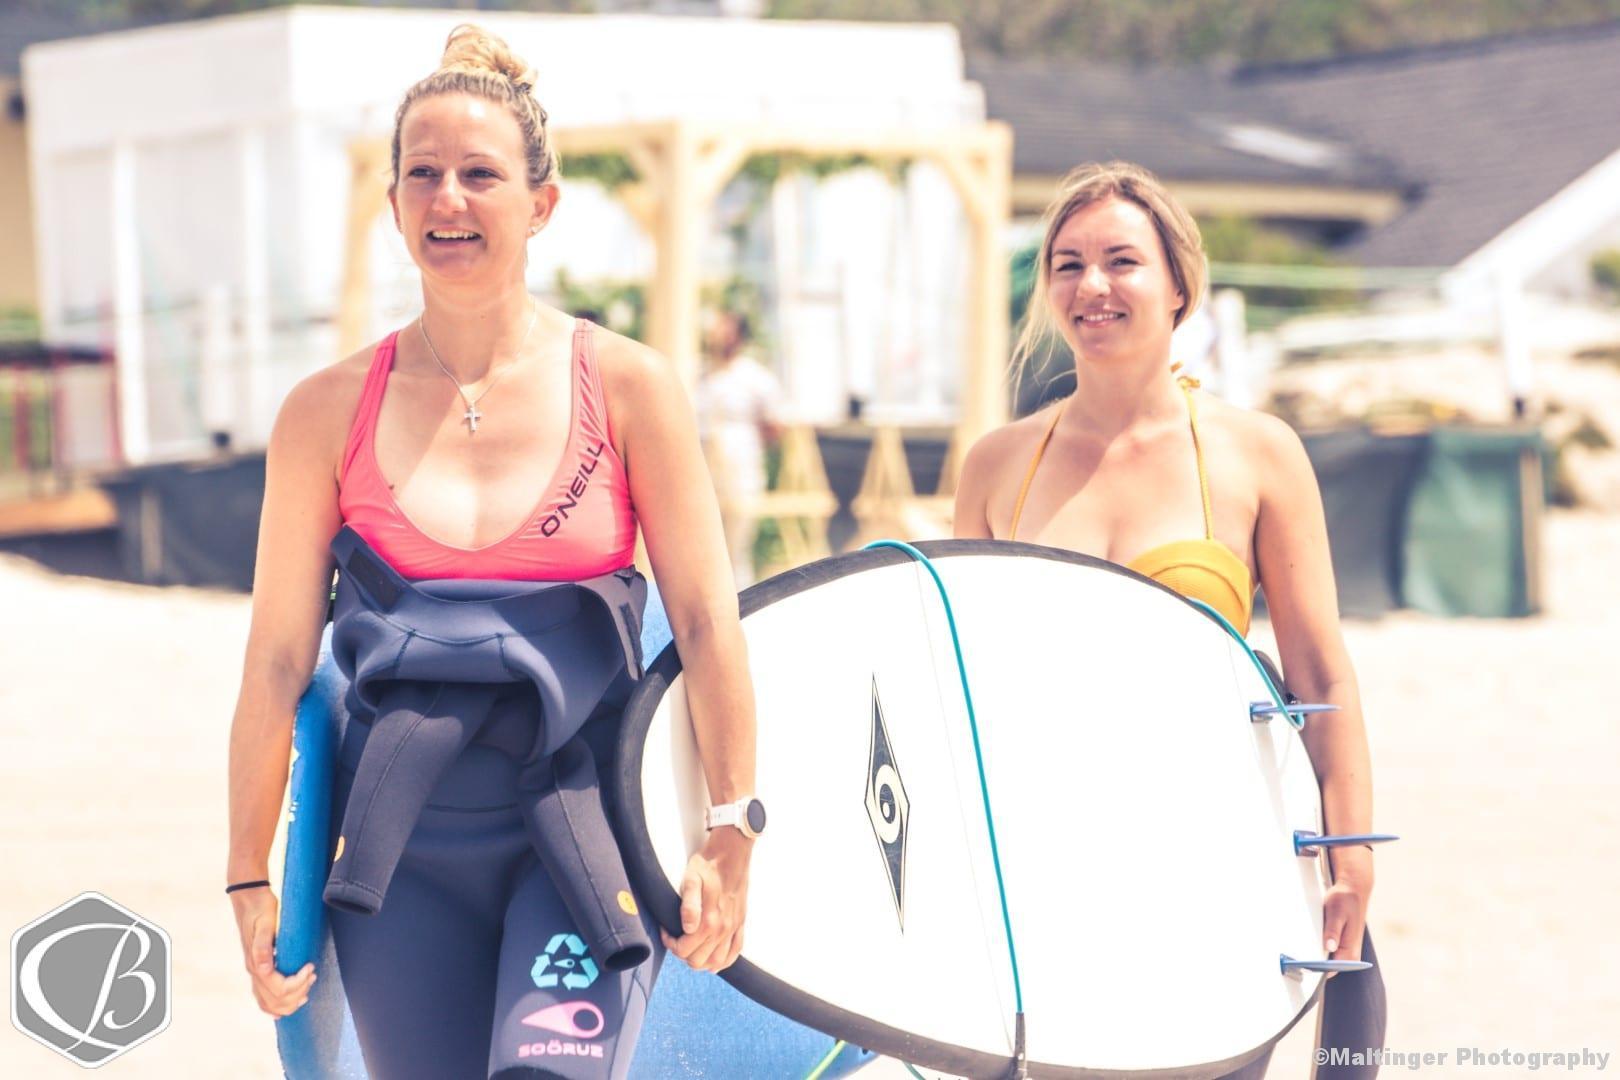 Portugal Moledo Fitnessreise Sufen Wellenreiten